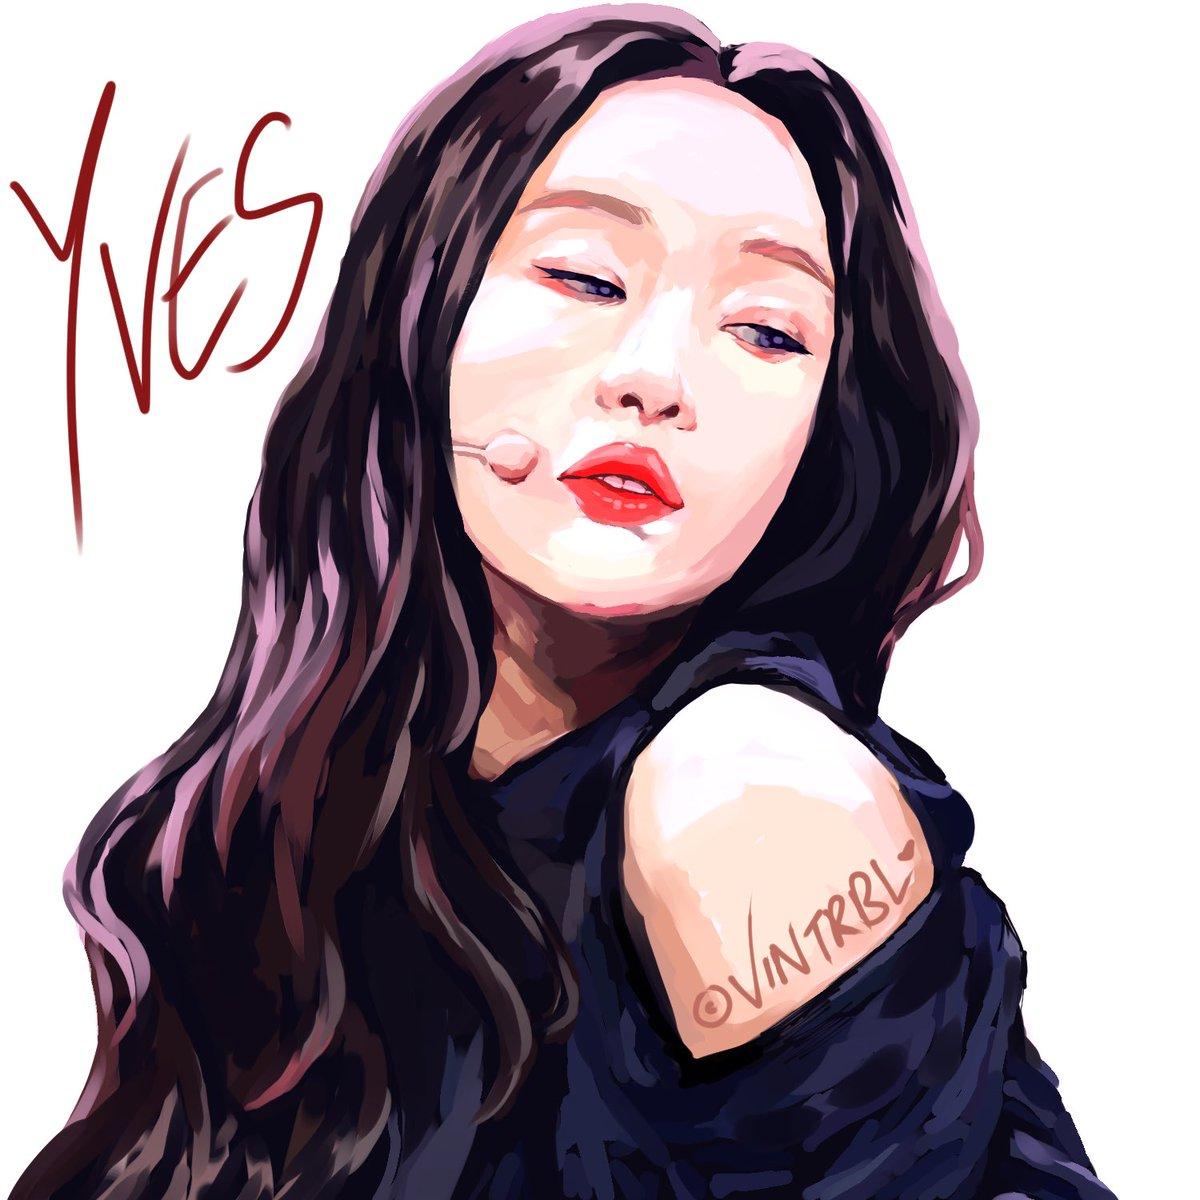 KCON Yves 🦢 by me #LOONA #Yves #loonafanart #art #kpopfanart #kpop